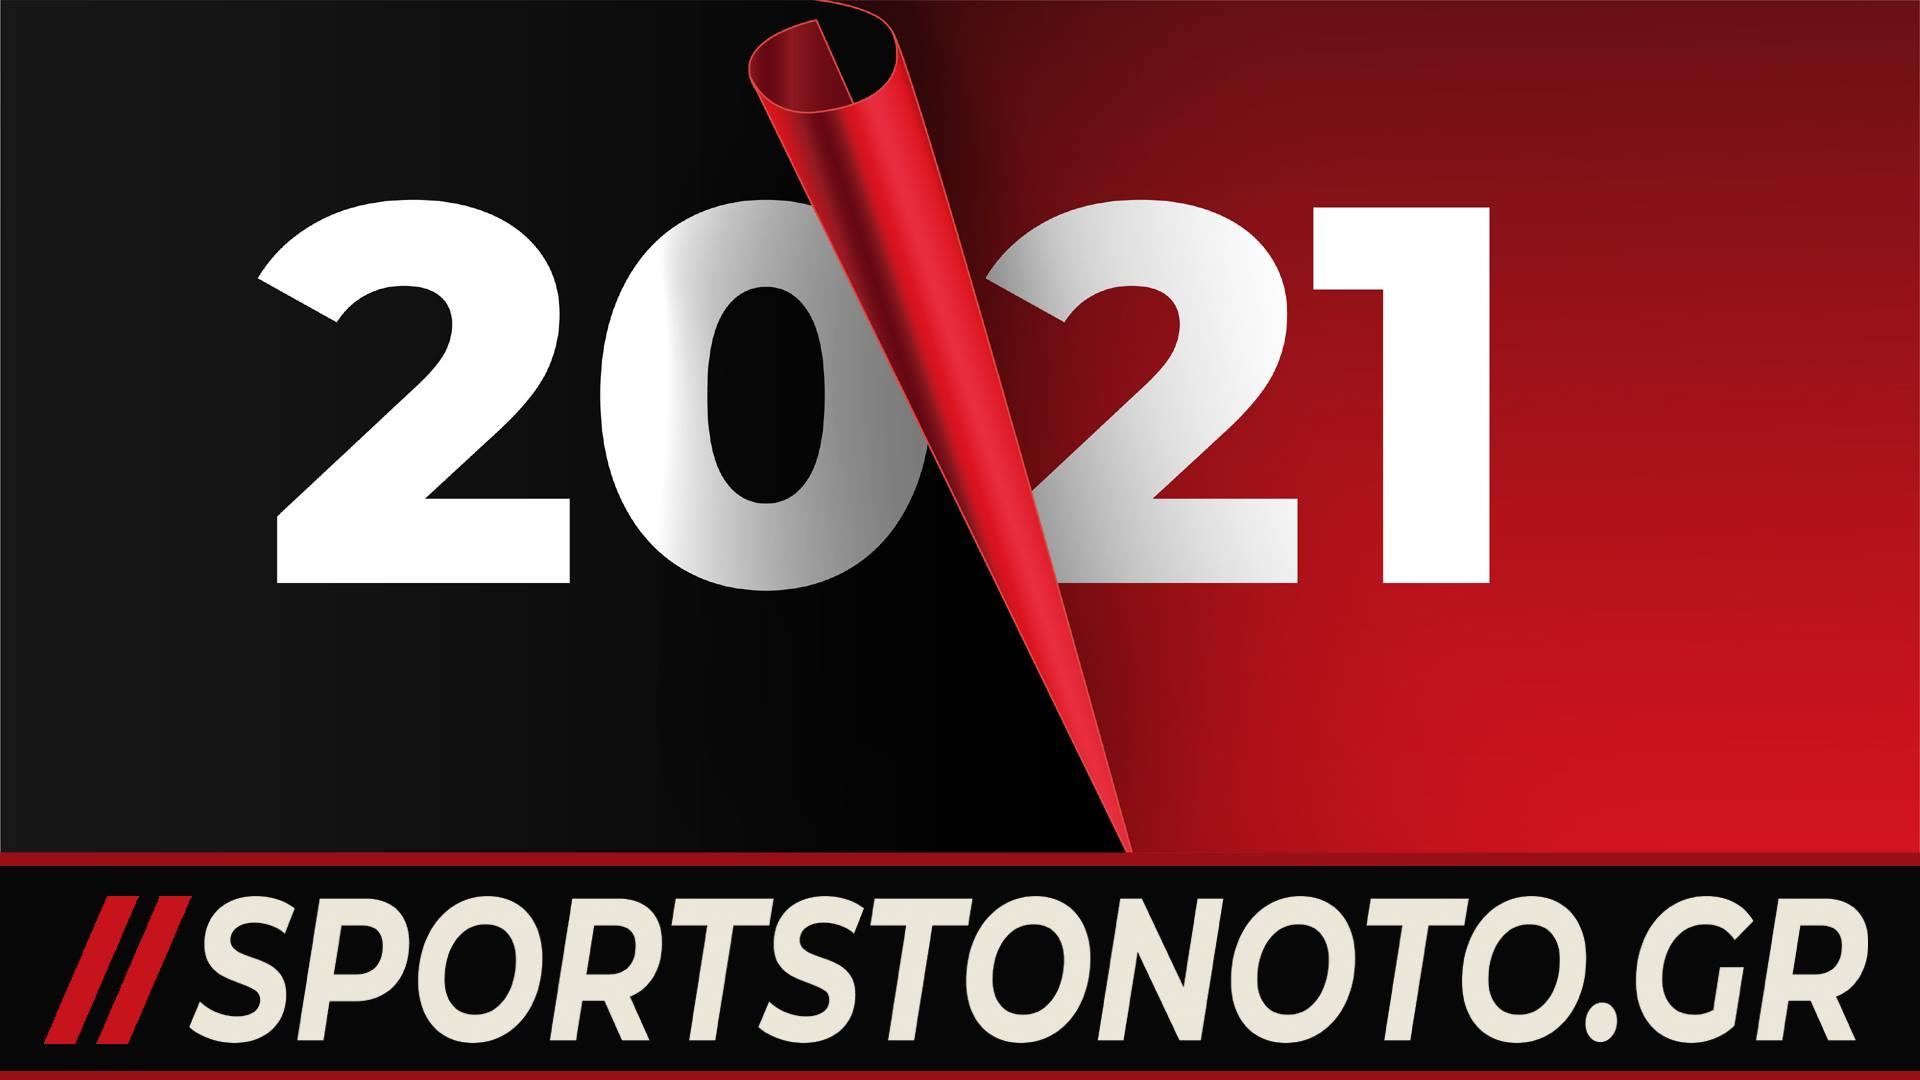 To Sportstonoto.gr σας εύχεται καλή χρονιά!